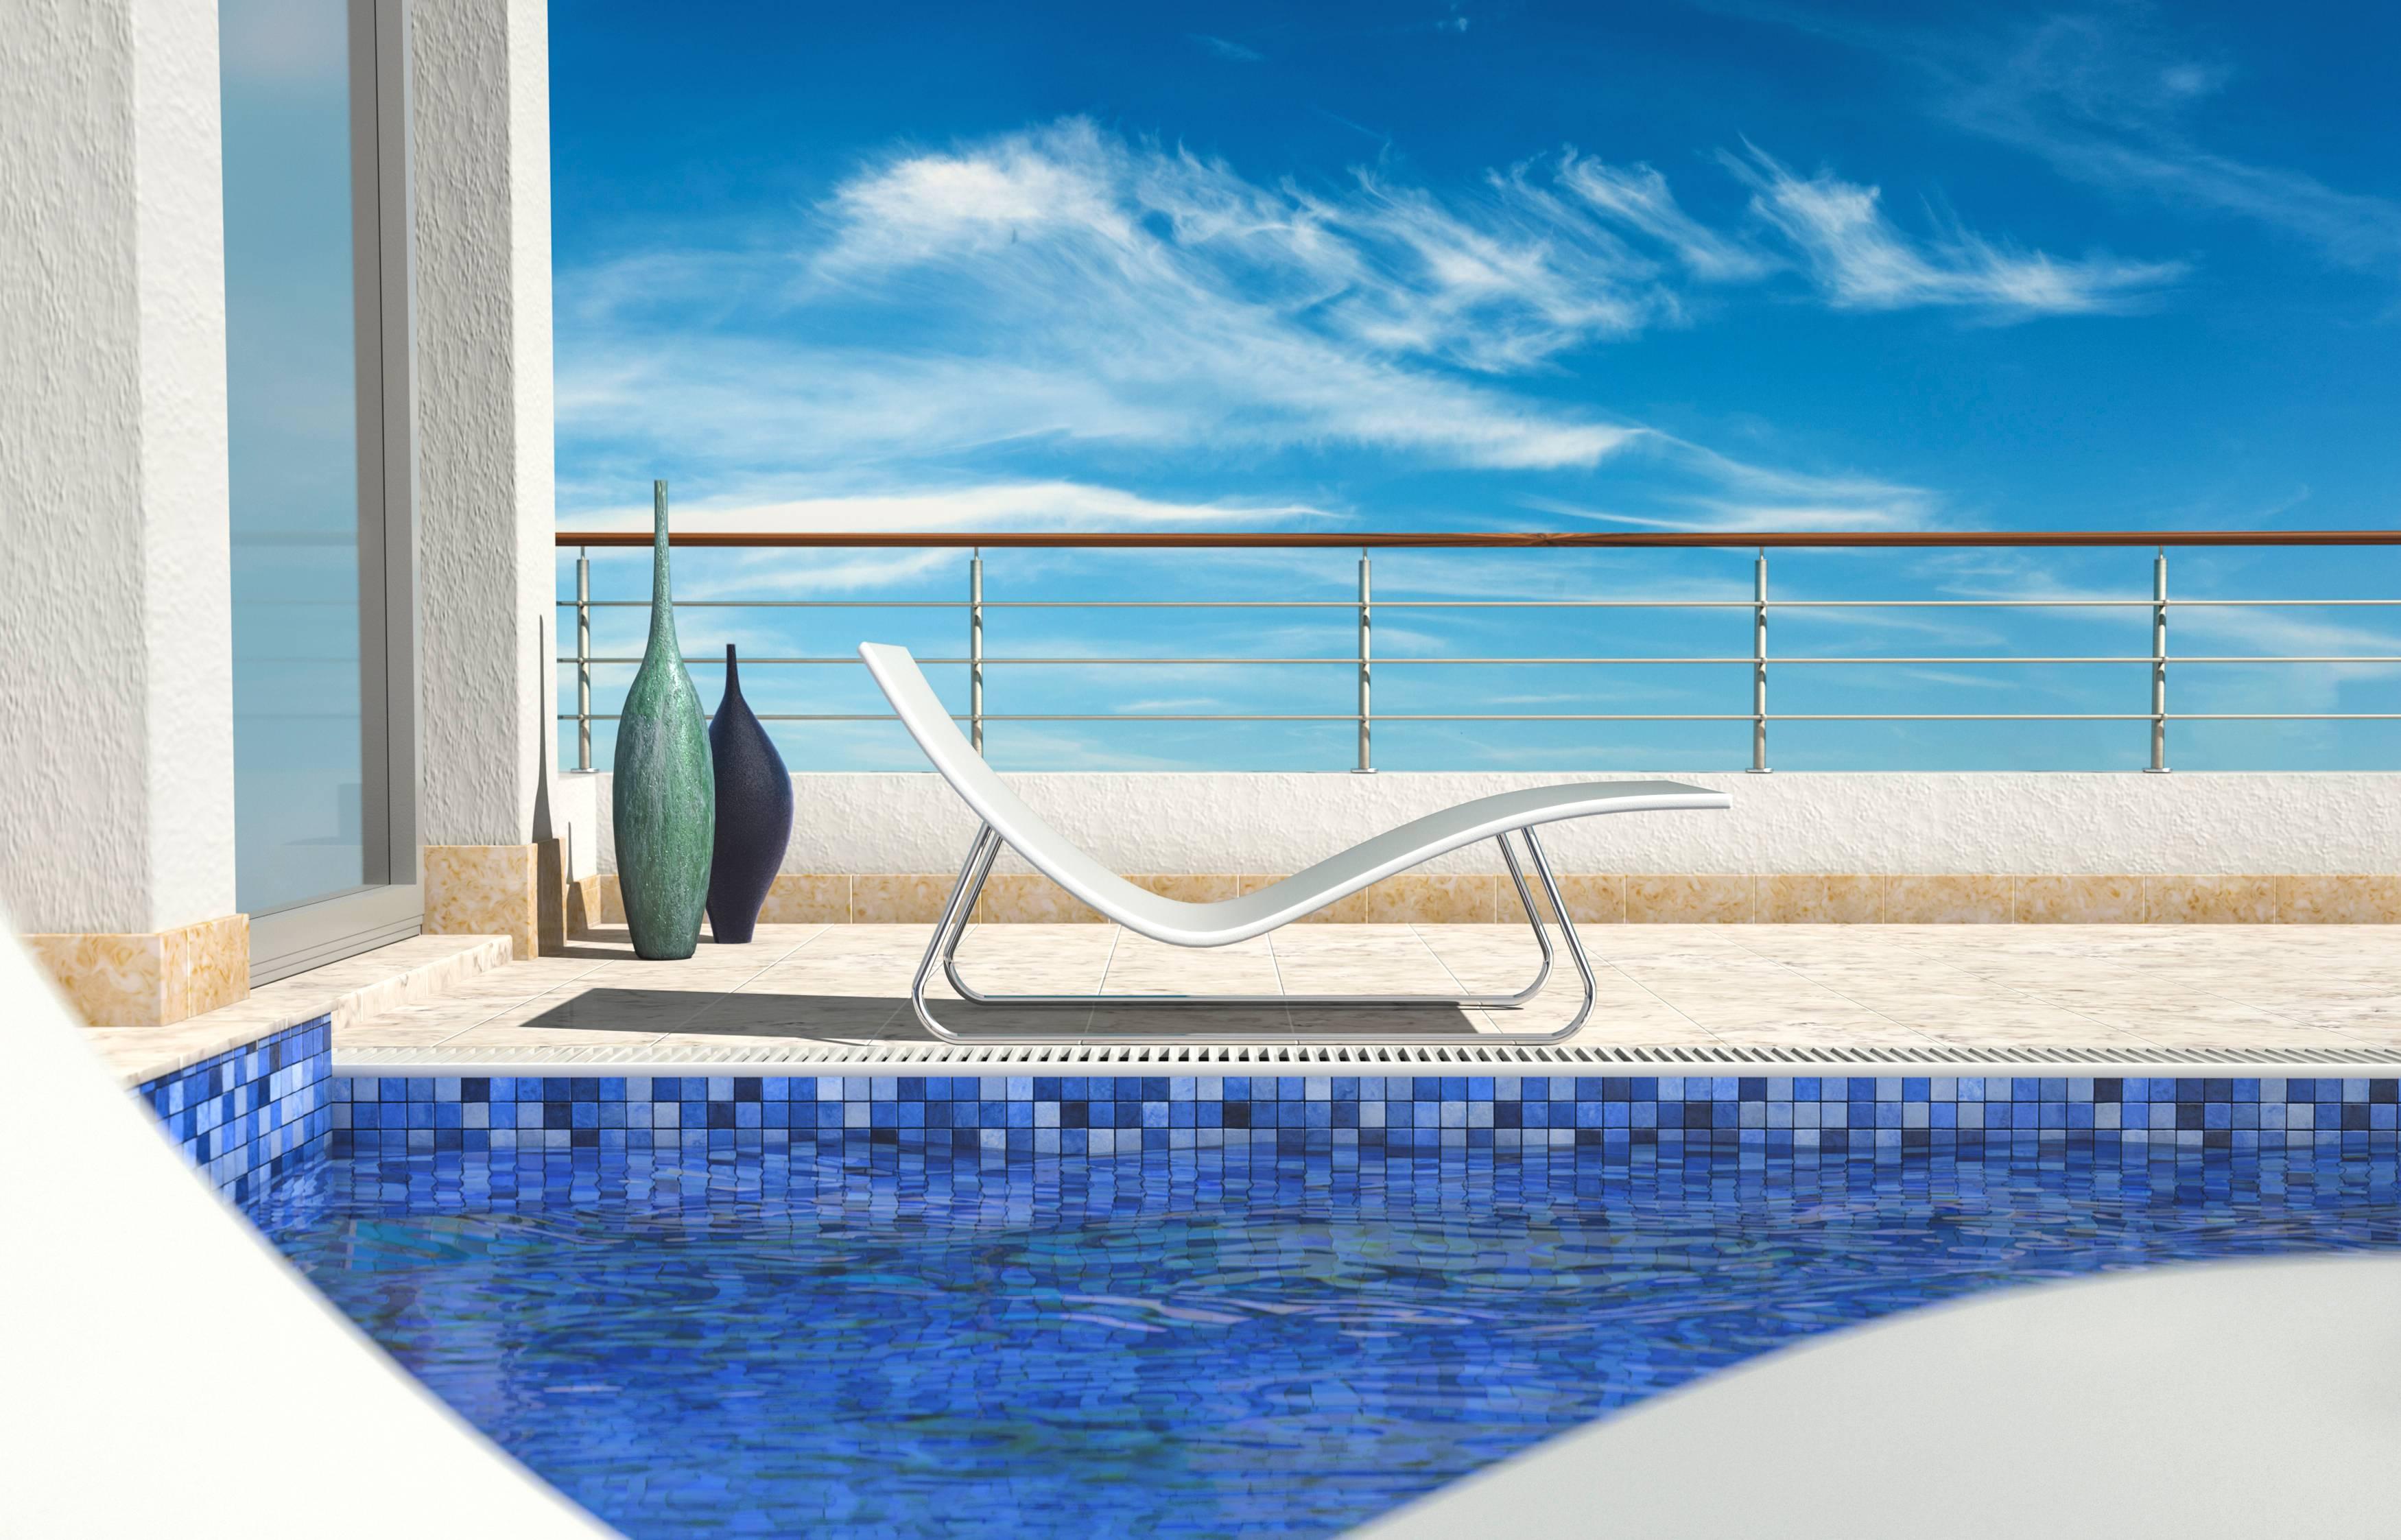 Conserver l 39 eau de sa piscine propre for Bien entretenir sa piscine